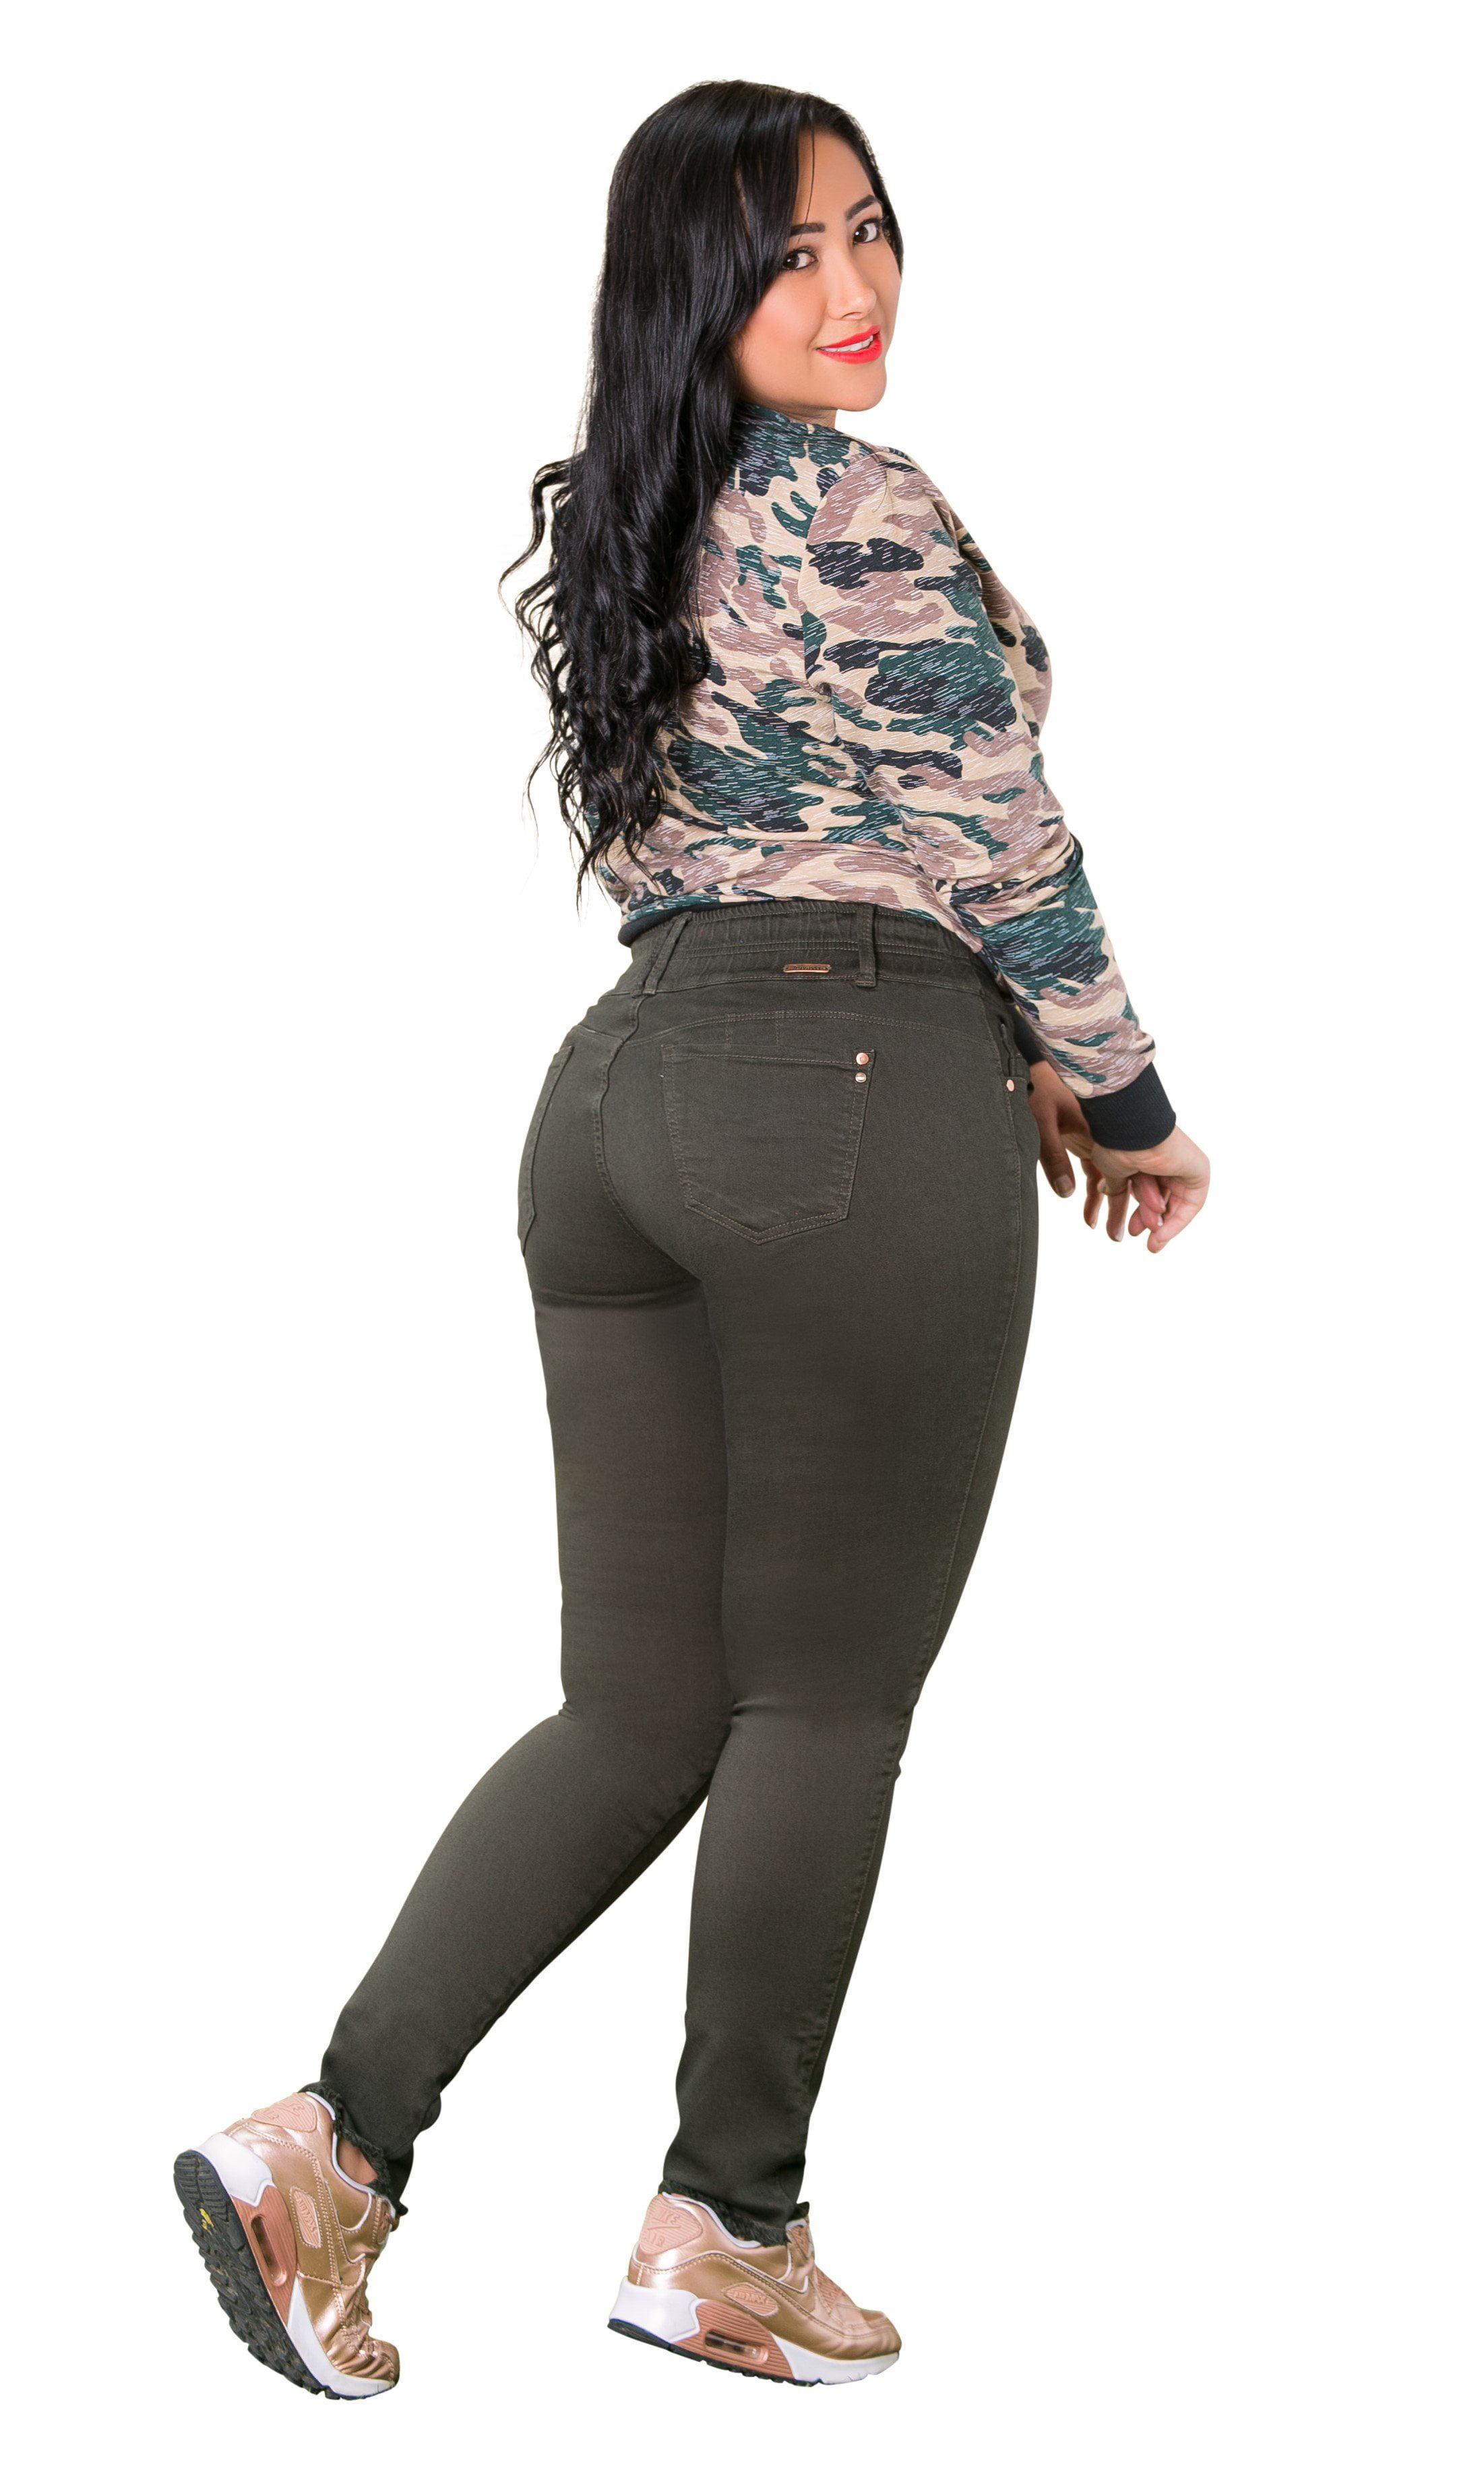 Moda Fabrics Moda Jeans Trivassi 100 Made In Colombia Butt Lifter Women Jeans Joggers Juniors Amp Plus Pantalones Colombianas Levantacola Military Green Walmart Com Walmart Com